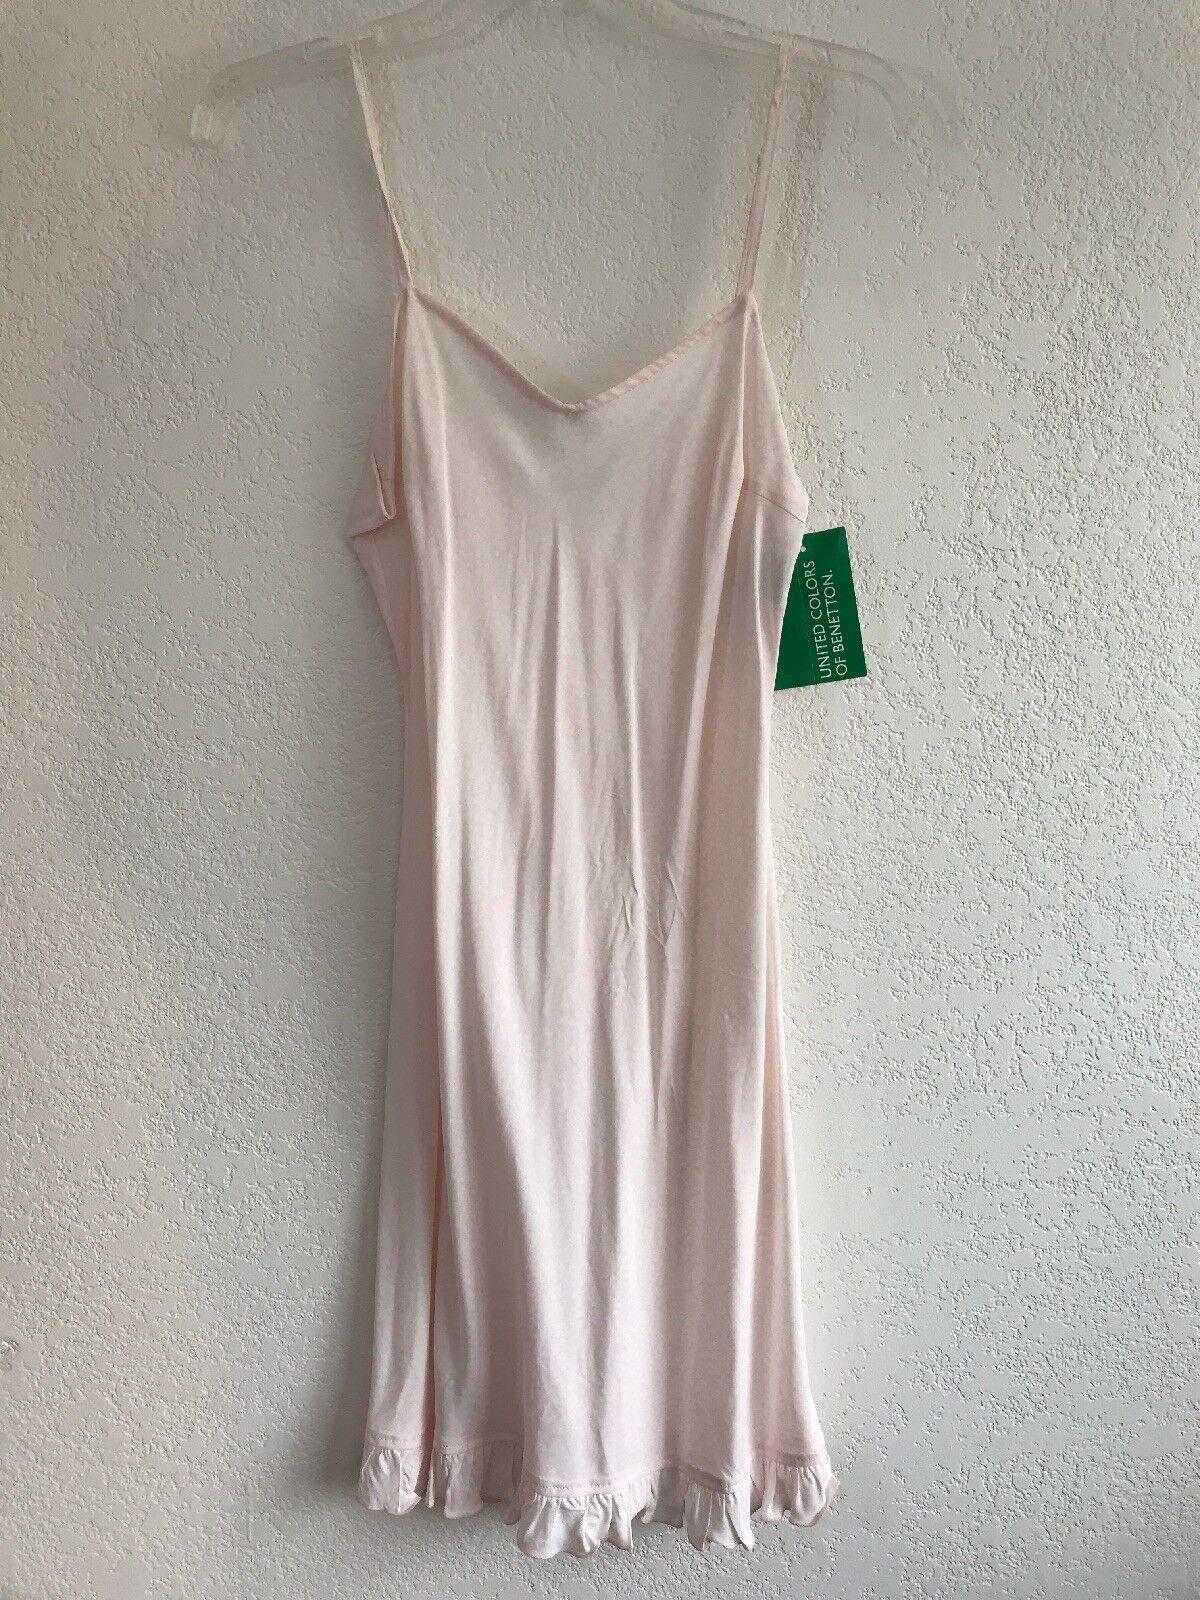 NWT United Farbes of Benetton Rosa Dress Small damen Strappy Slip Ruffle Hem